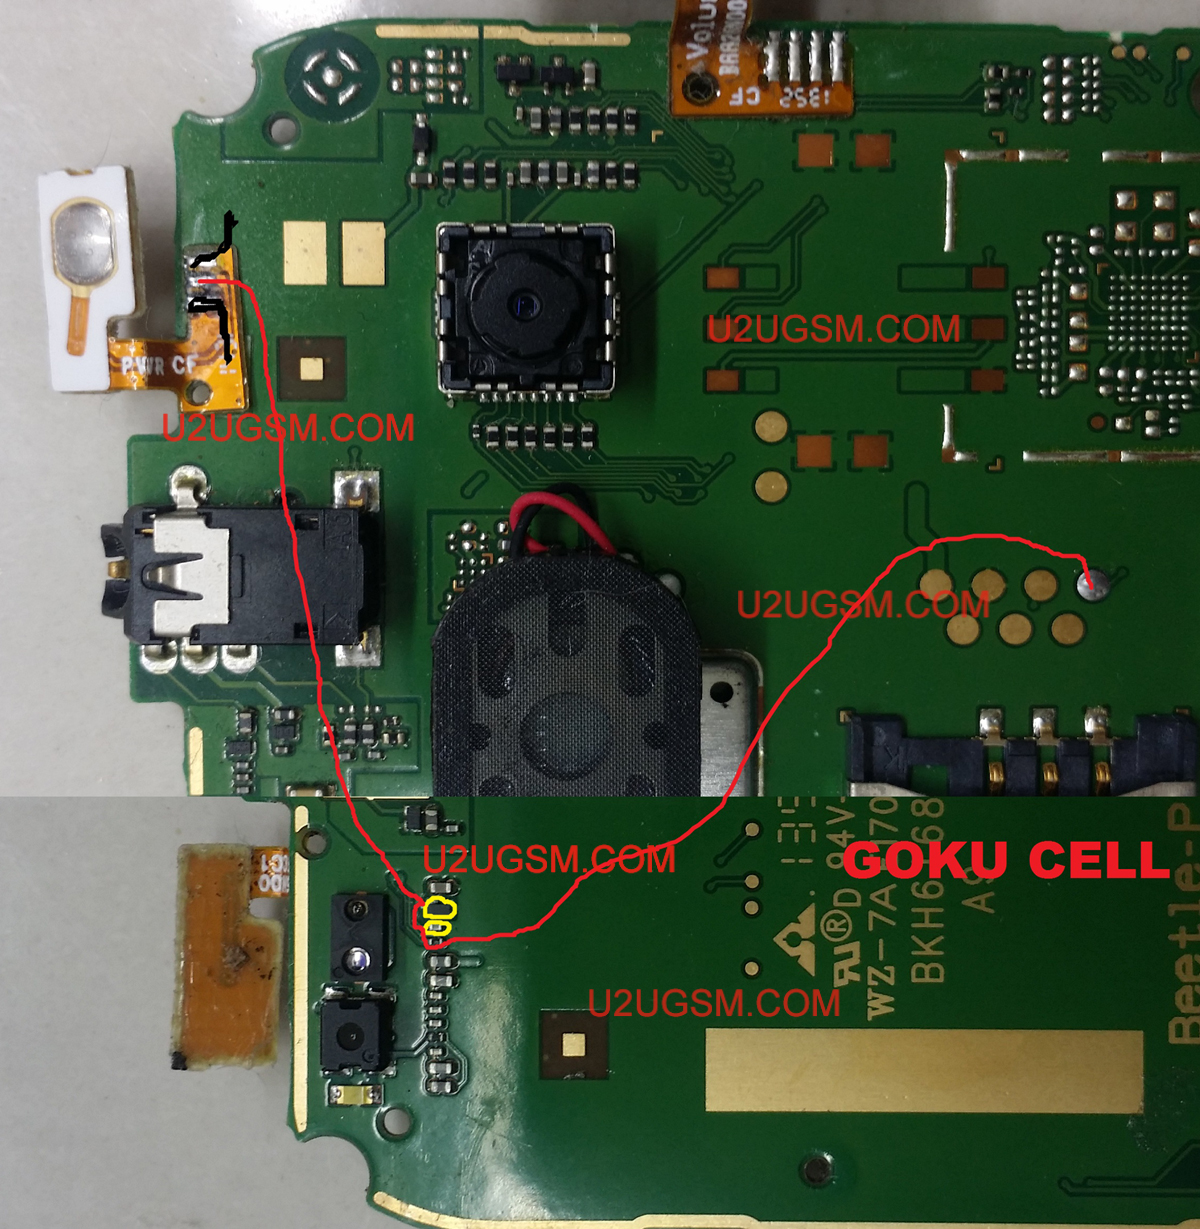 Sony Cdxr3300 Wiring Diagram This Is The Wiring Diagram O